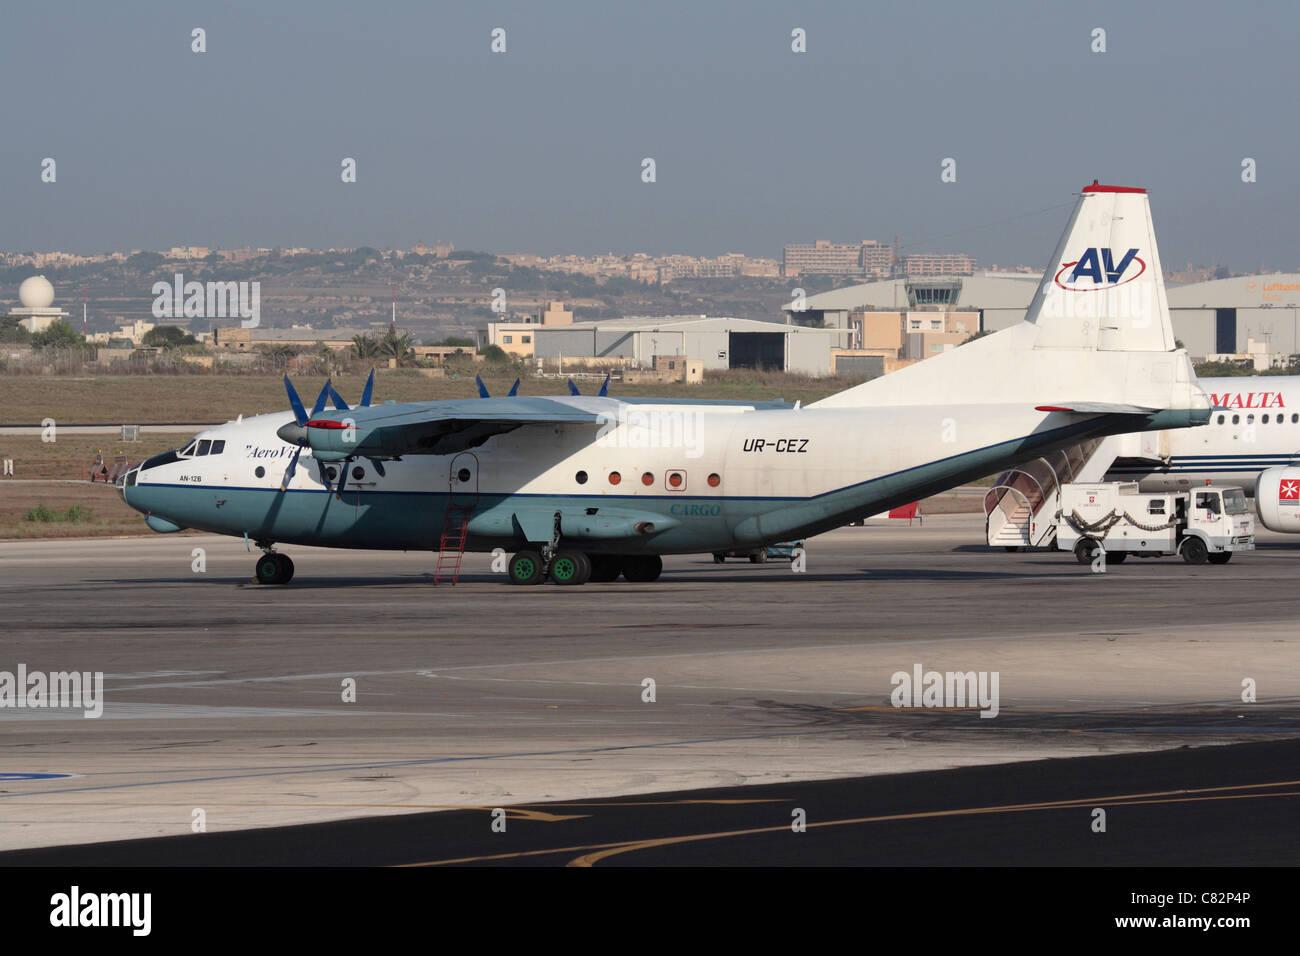 Aerovis Airlines Antonov An-12 cargo plane - Stock Image